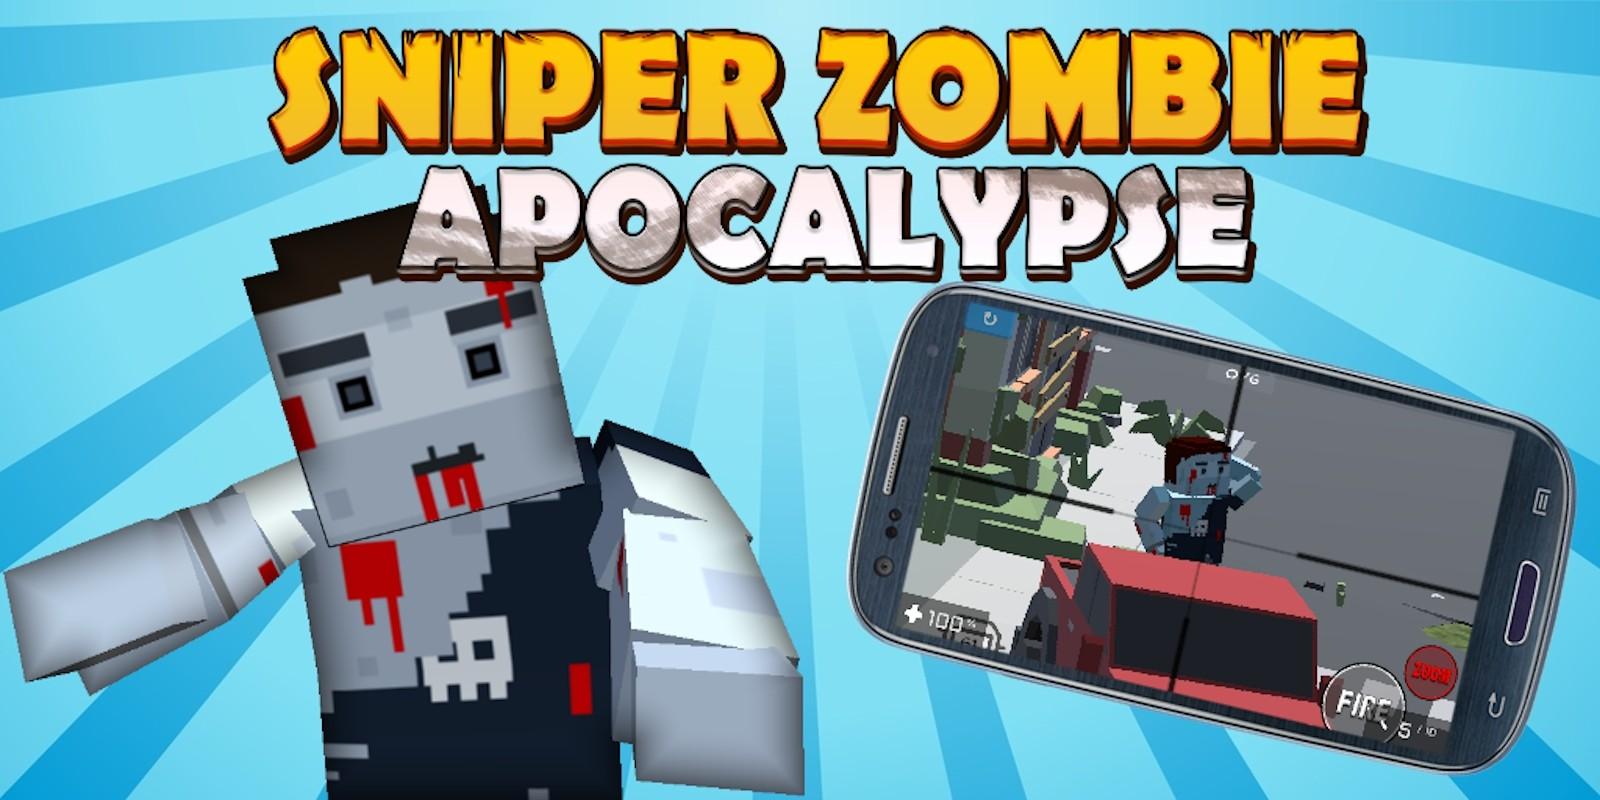 Sniper Zombie Apocalypse - Unity Complete Project